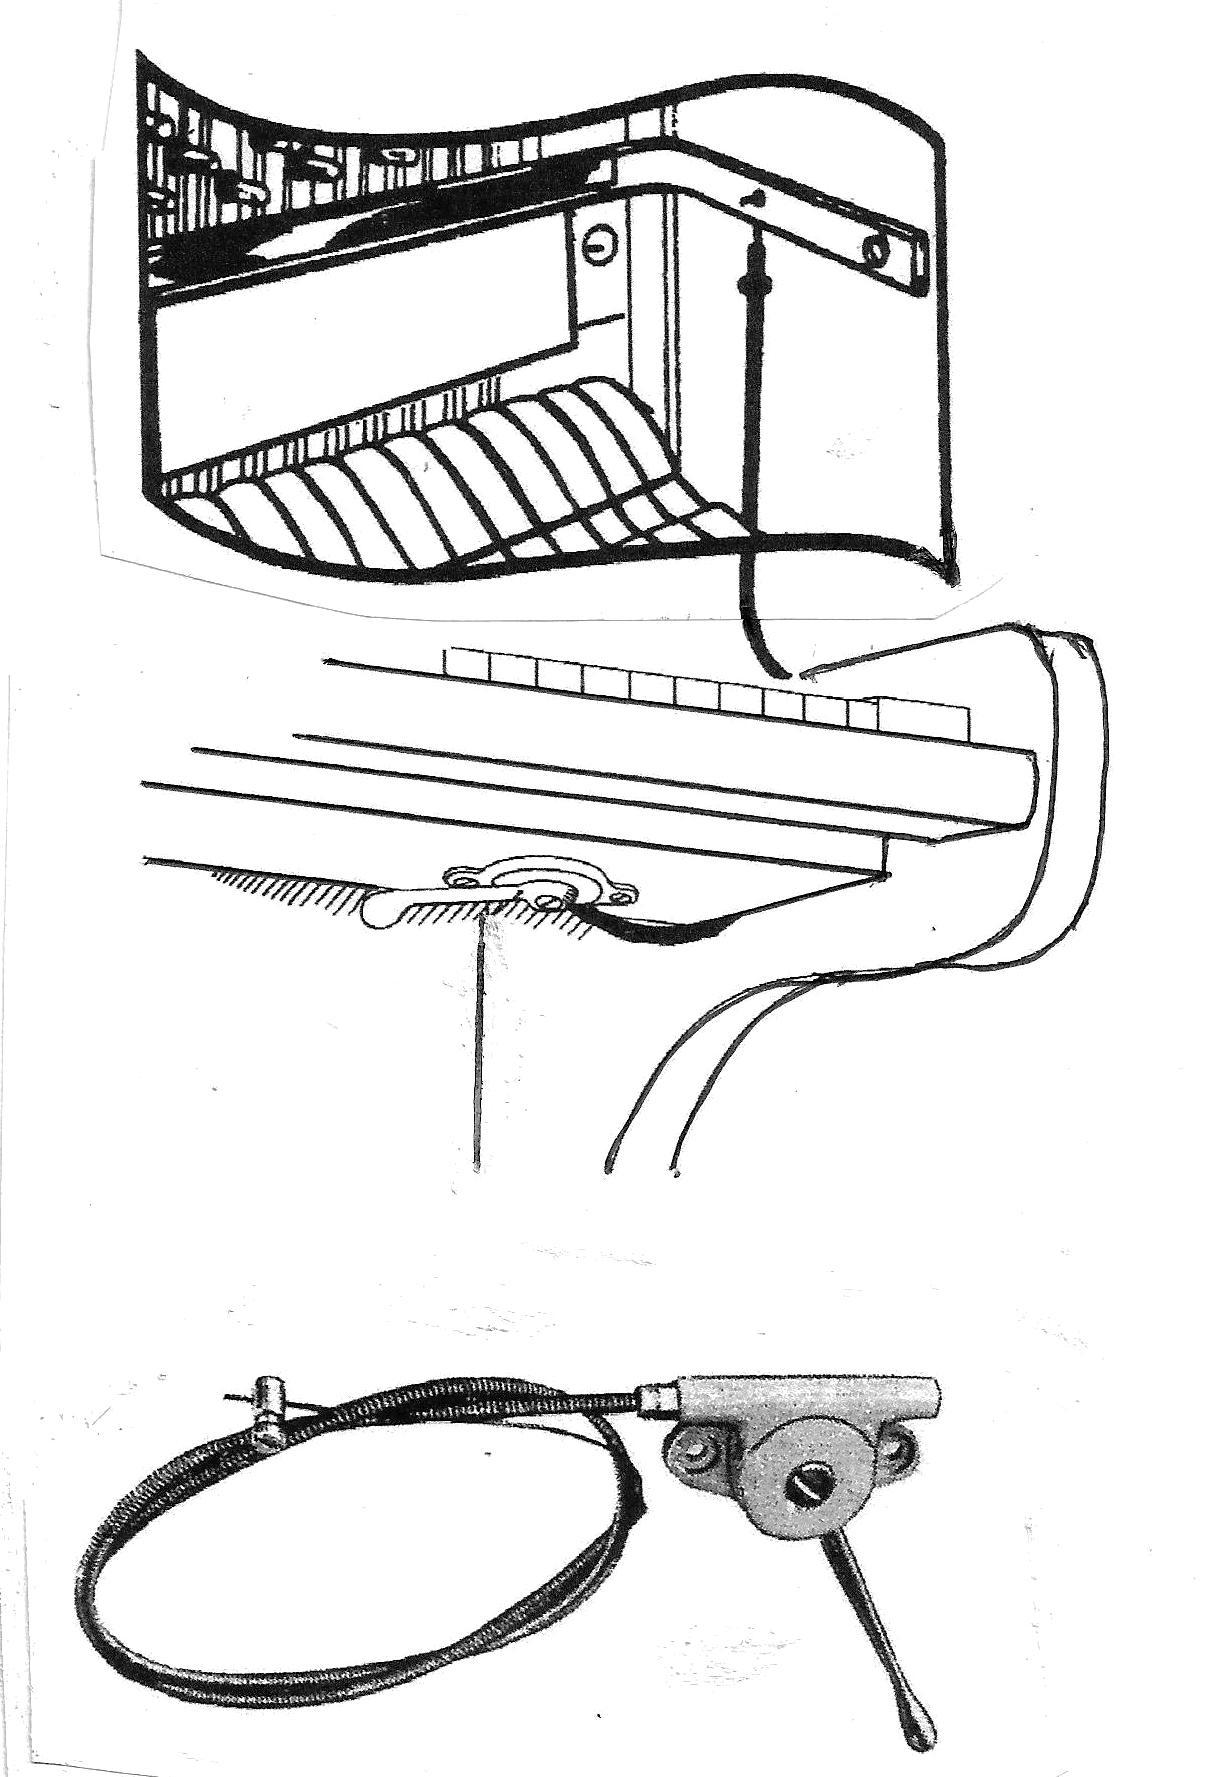 2691 piano wire uk piano wire uk piano wire b&q including piano wire,Peterson Trailer Wiring Diagram